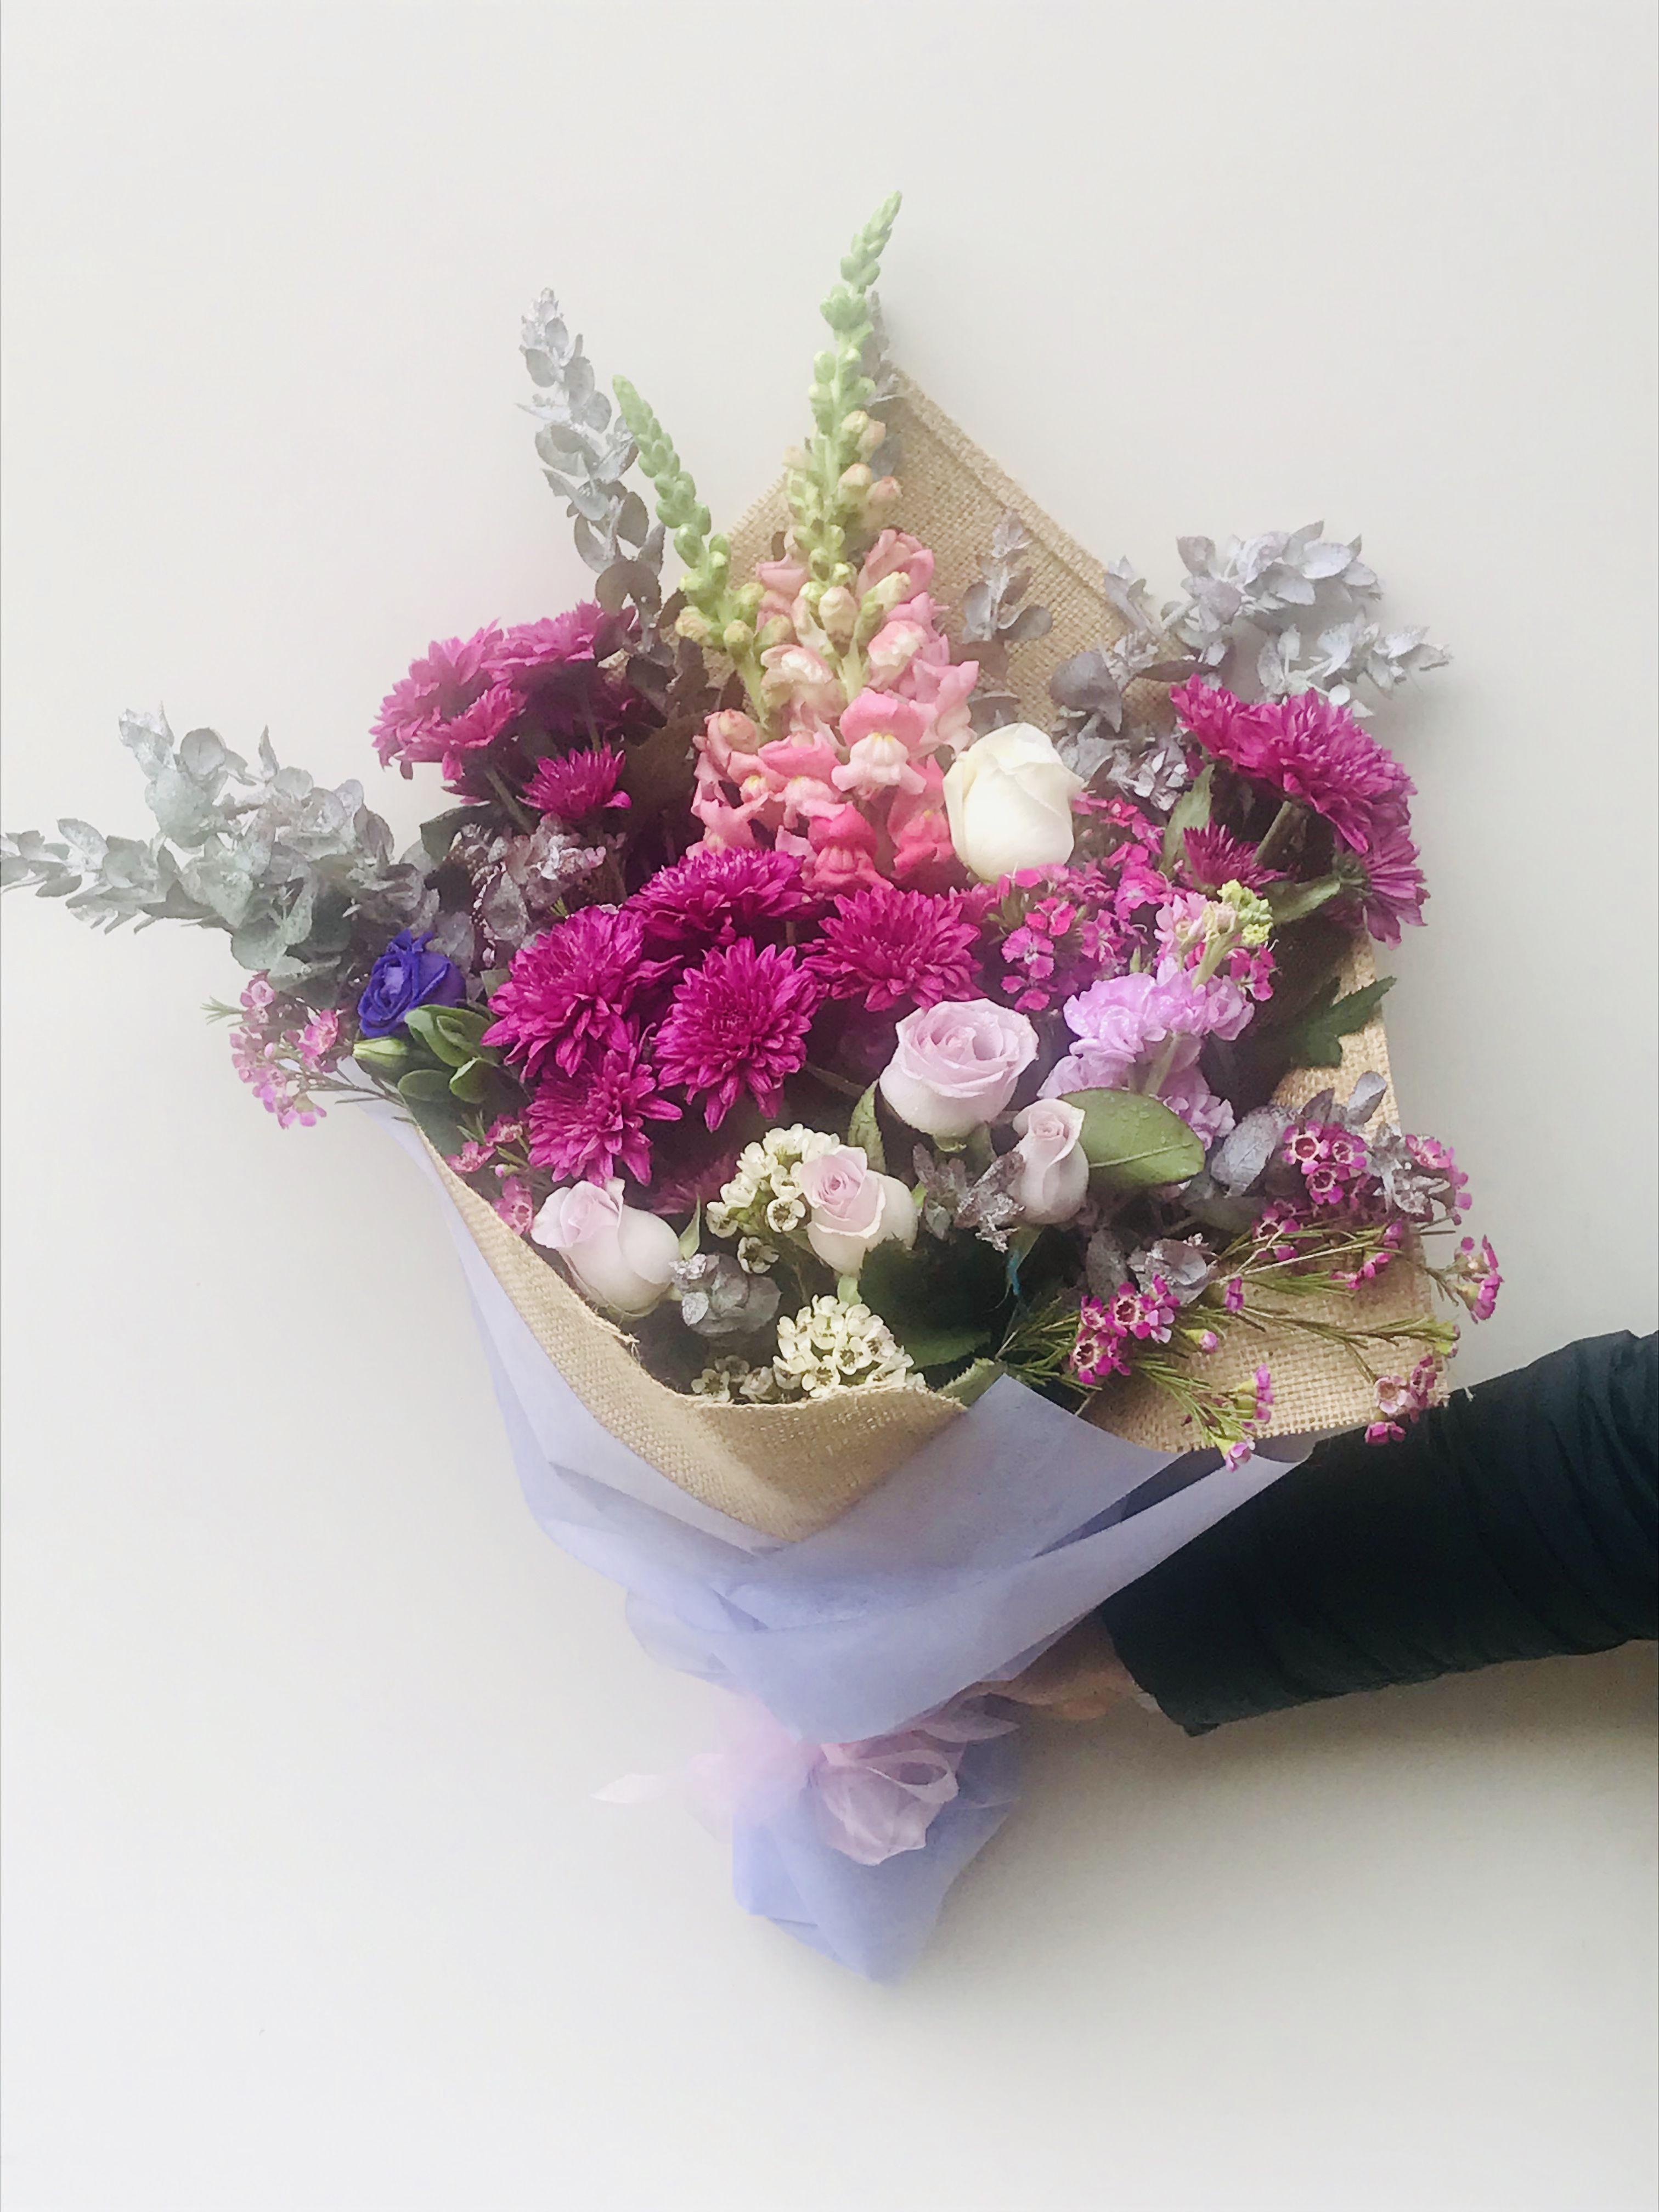 Get the freshest flowers delivered in Melbourne. Same day